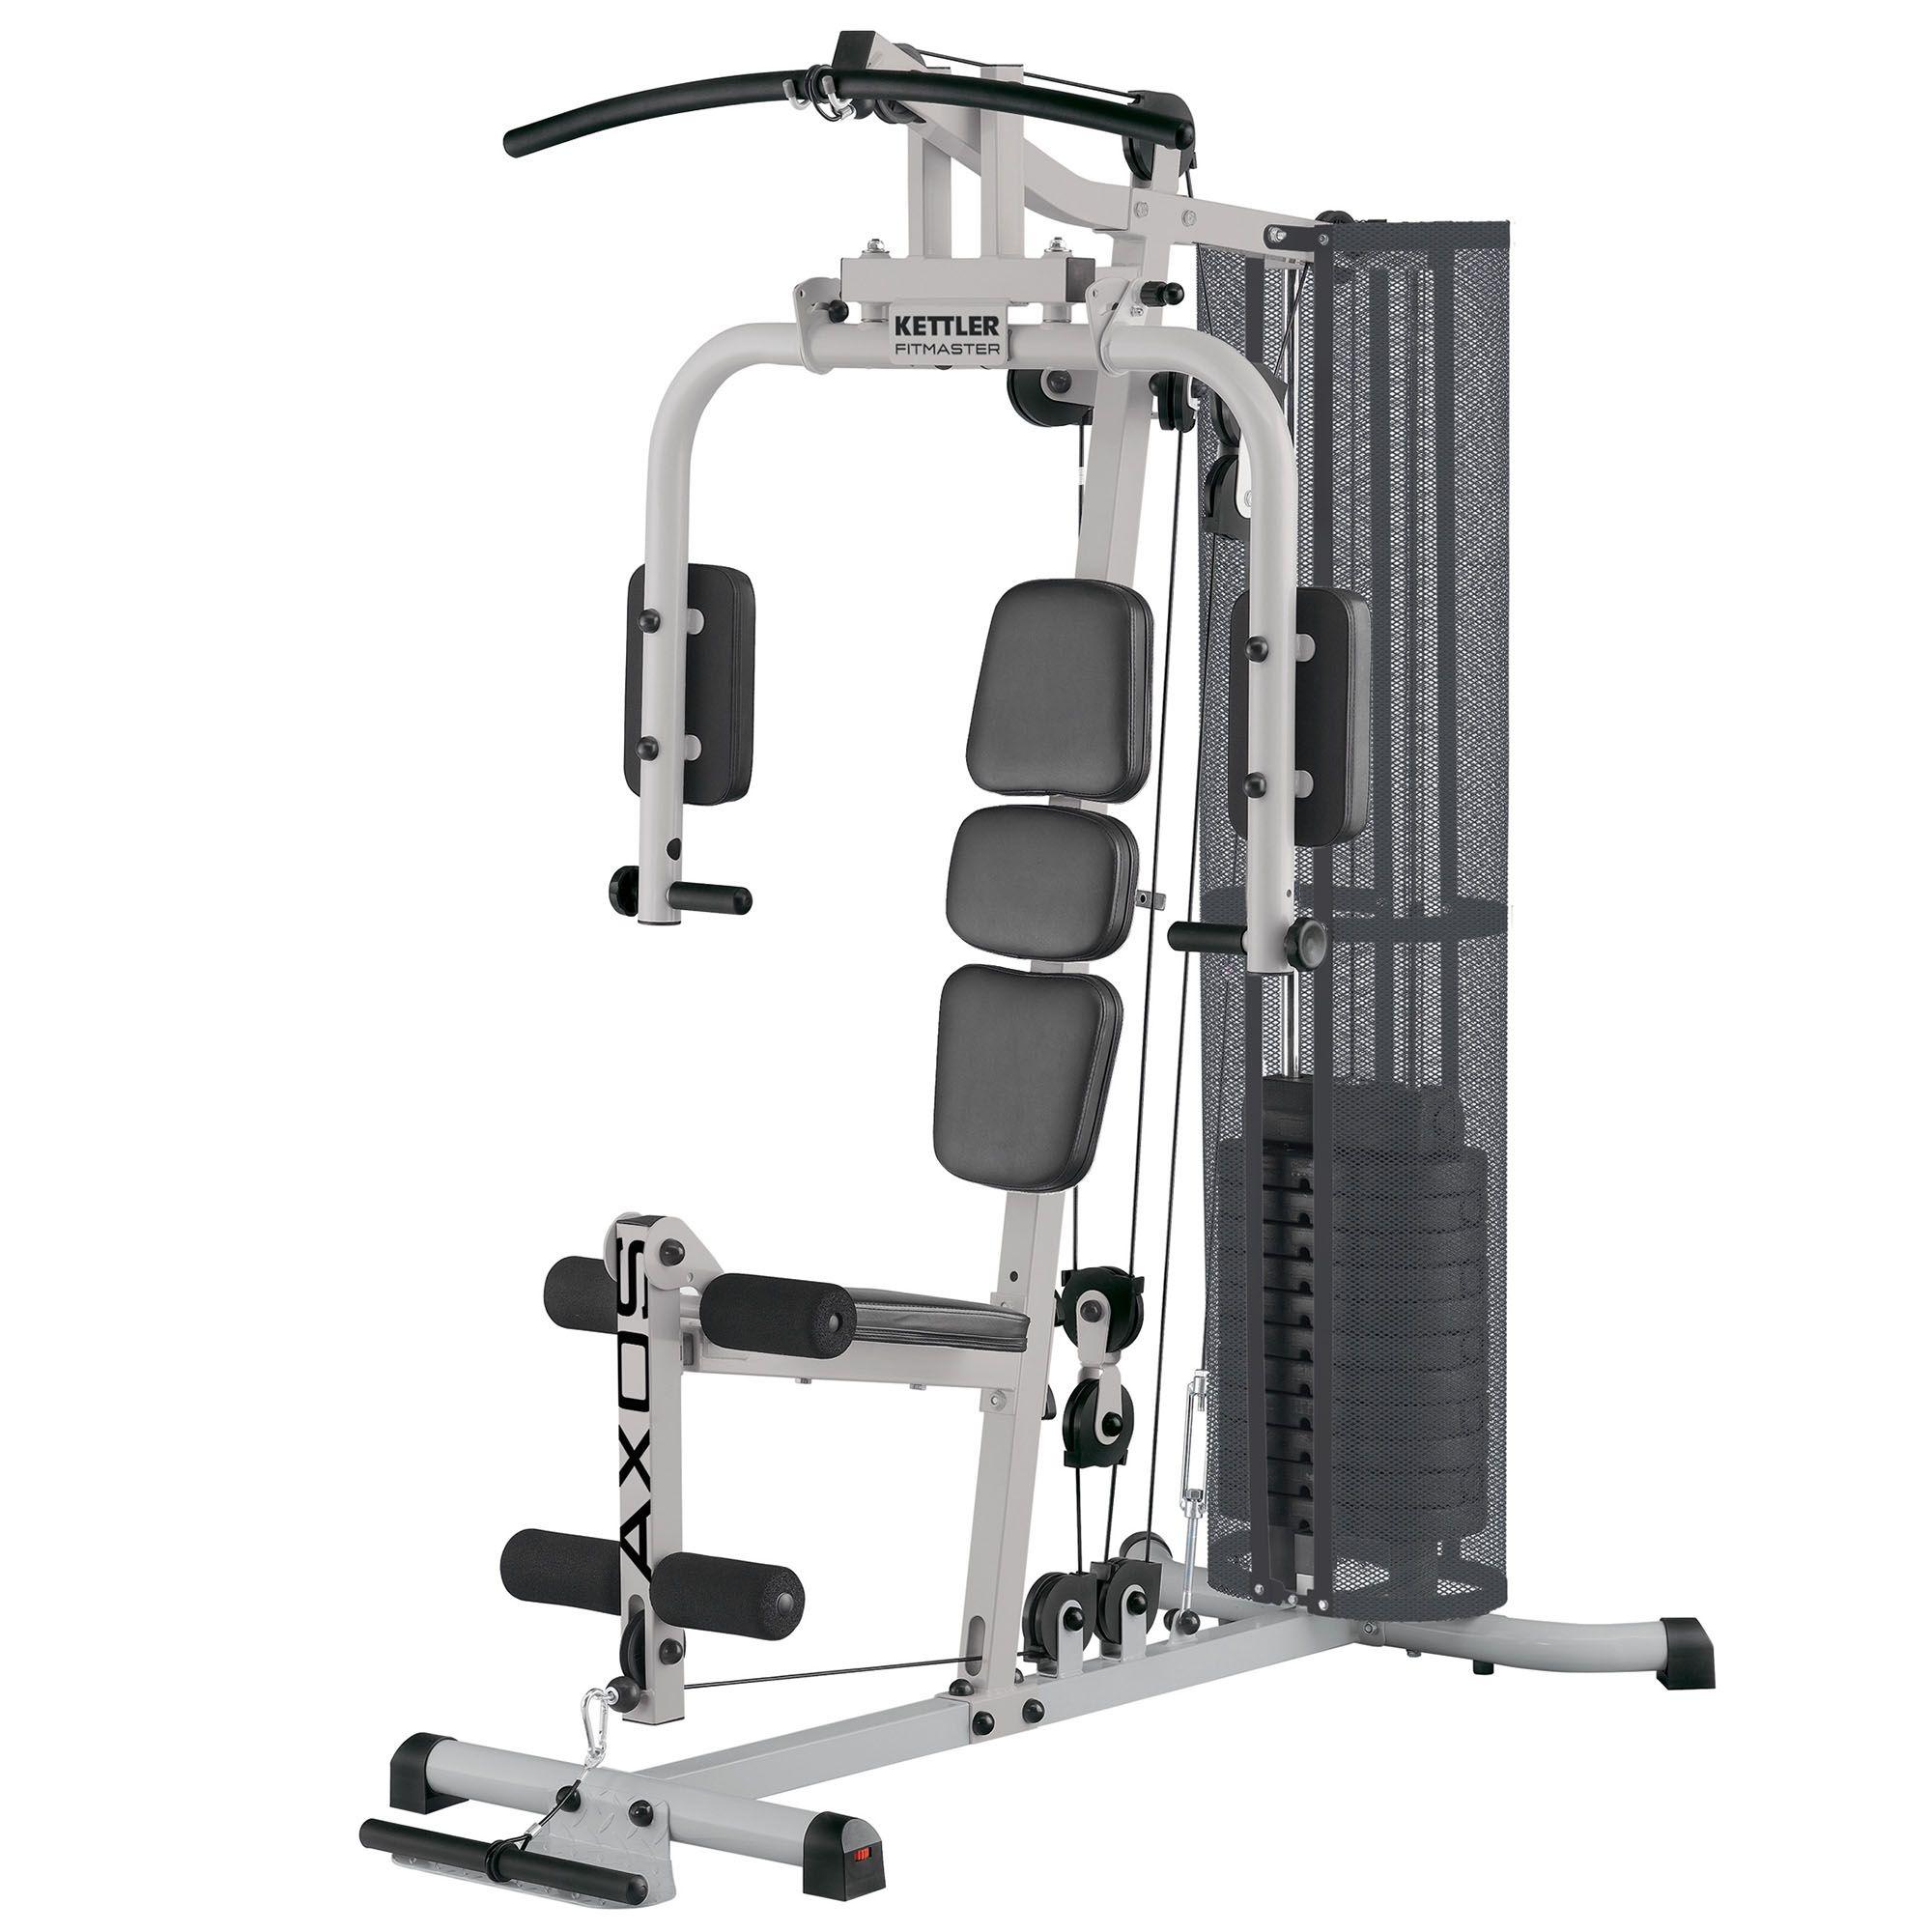 Kettler axos fitmaster multi gym - Banc de musculation kettler sport rouge ...